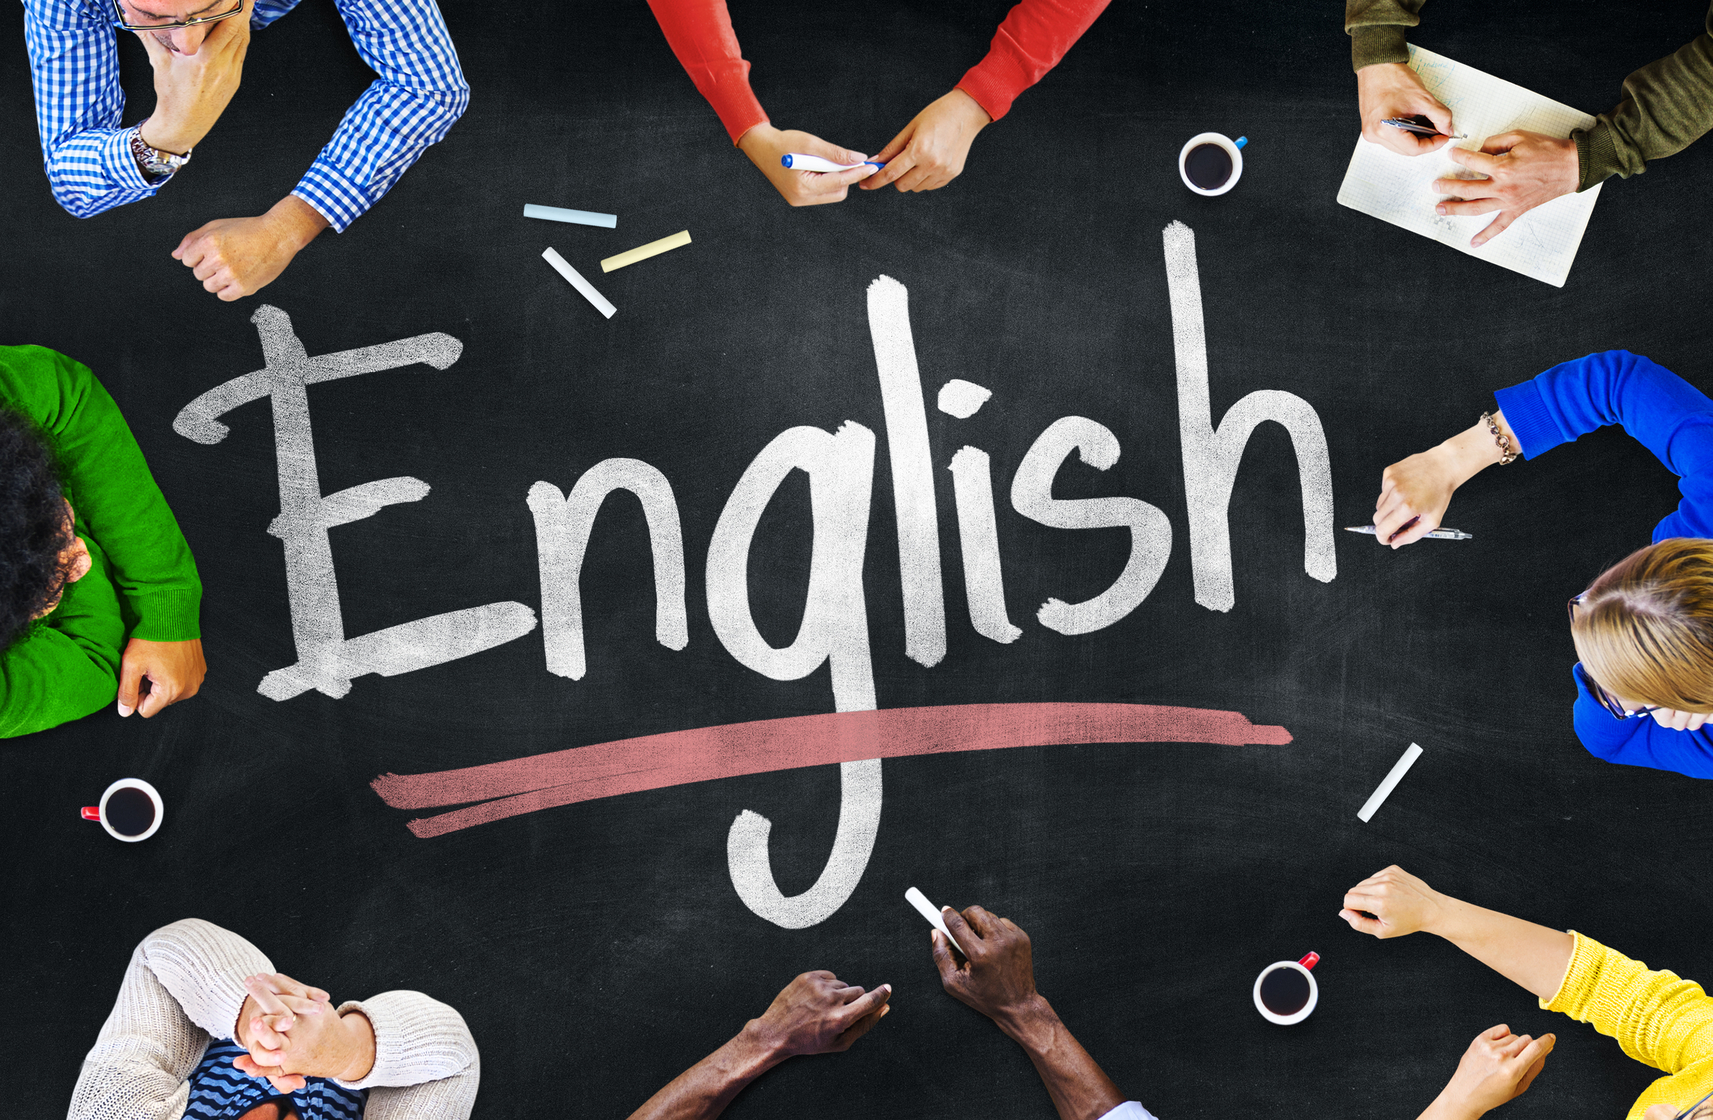 Opposite Words คำตรงข้าม เรียนภาษาอังกฤษ